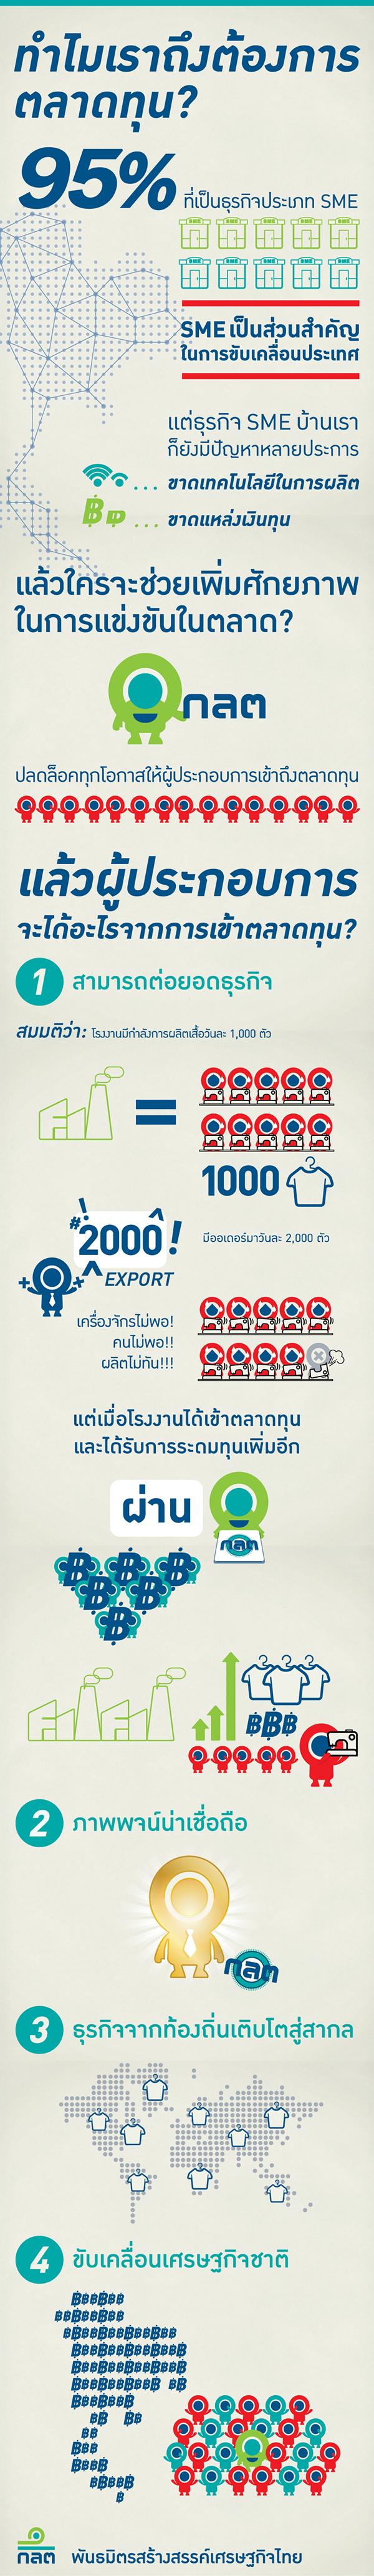 pitch Visual Narrative Illustrator Flash Video Editing keynotes Capital Market Thailand SME infographic simple Thai